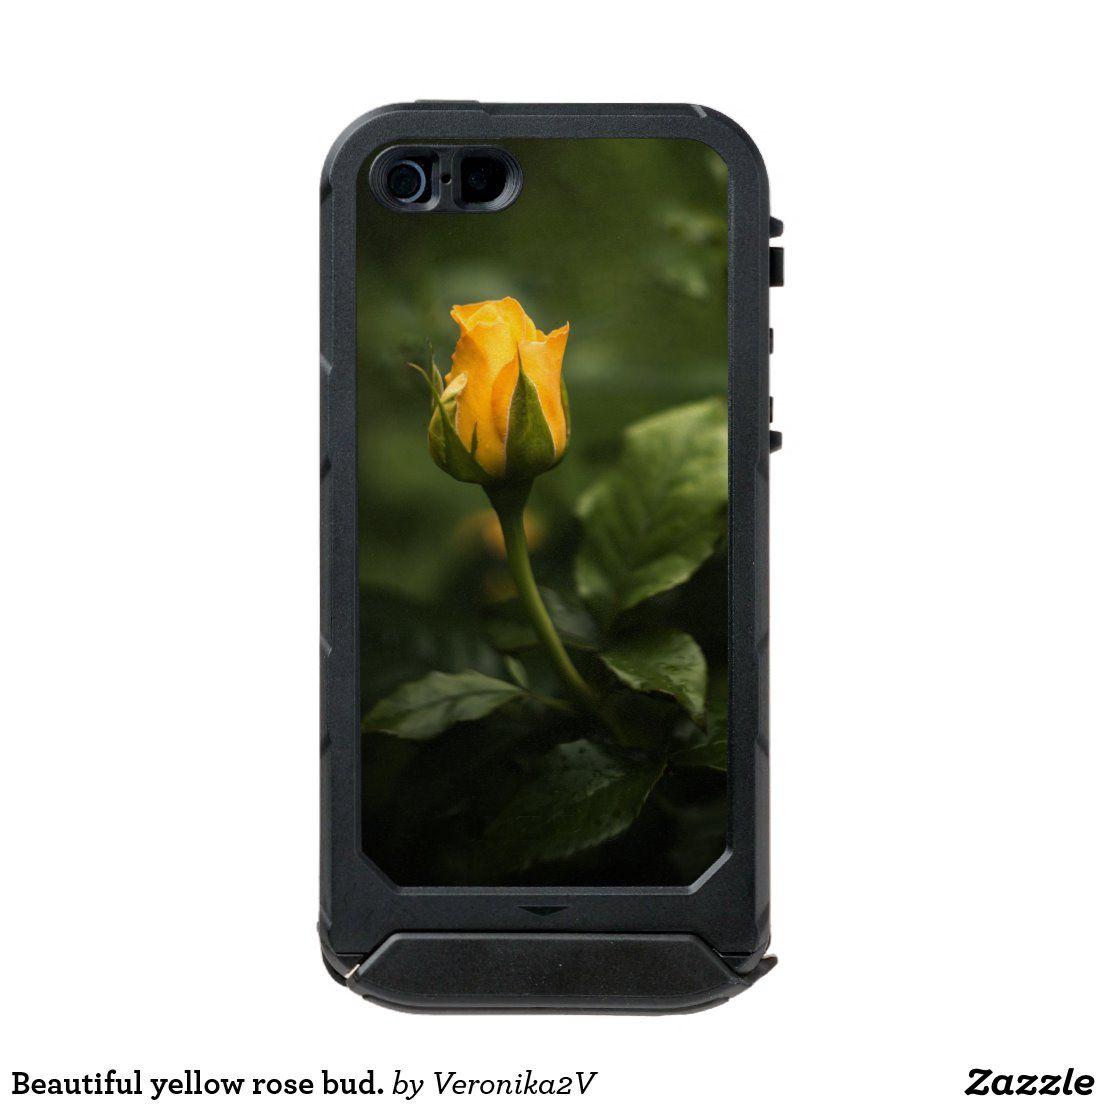 Beautiful yellow rose bud incipio iphone case zazzle